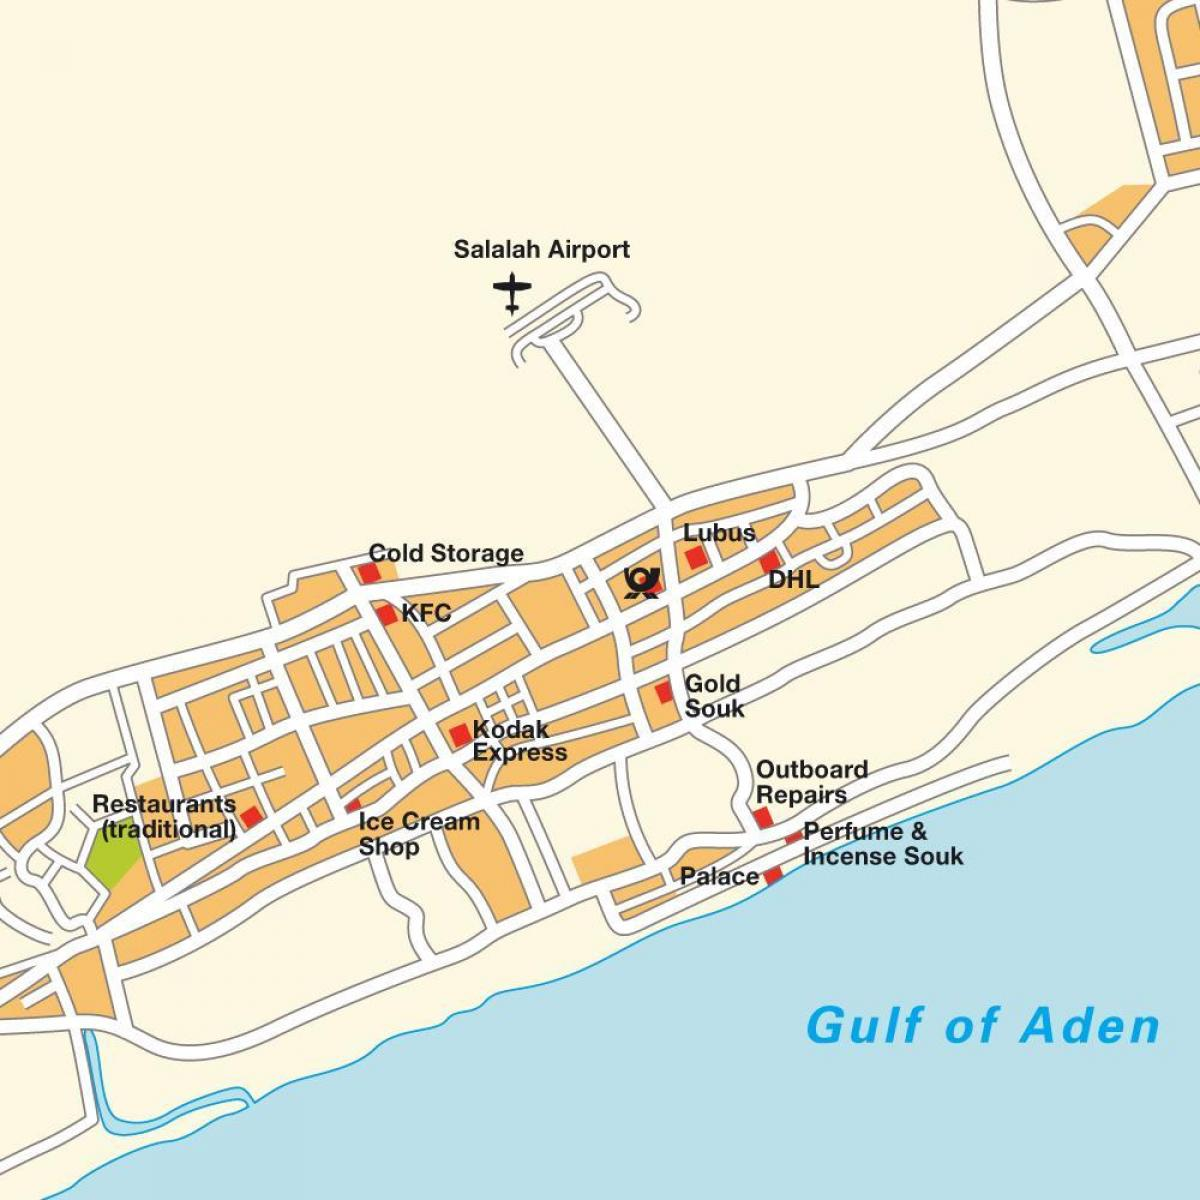 Karte Oman Salalah.Salalah Im Oman Map Karte Von Salalah Im Oman West Asien